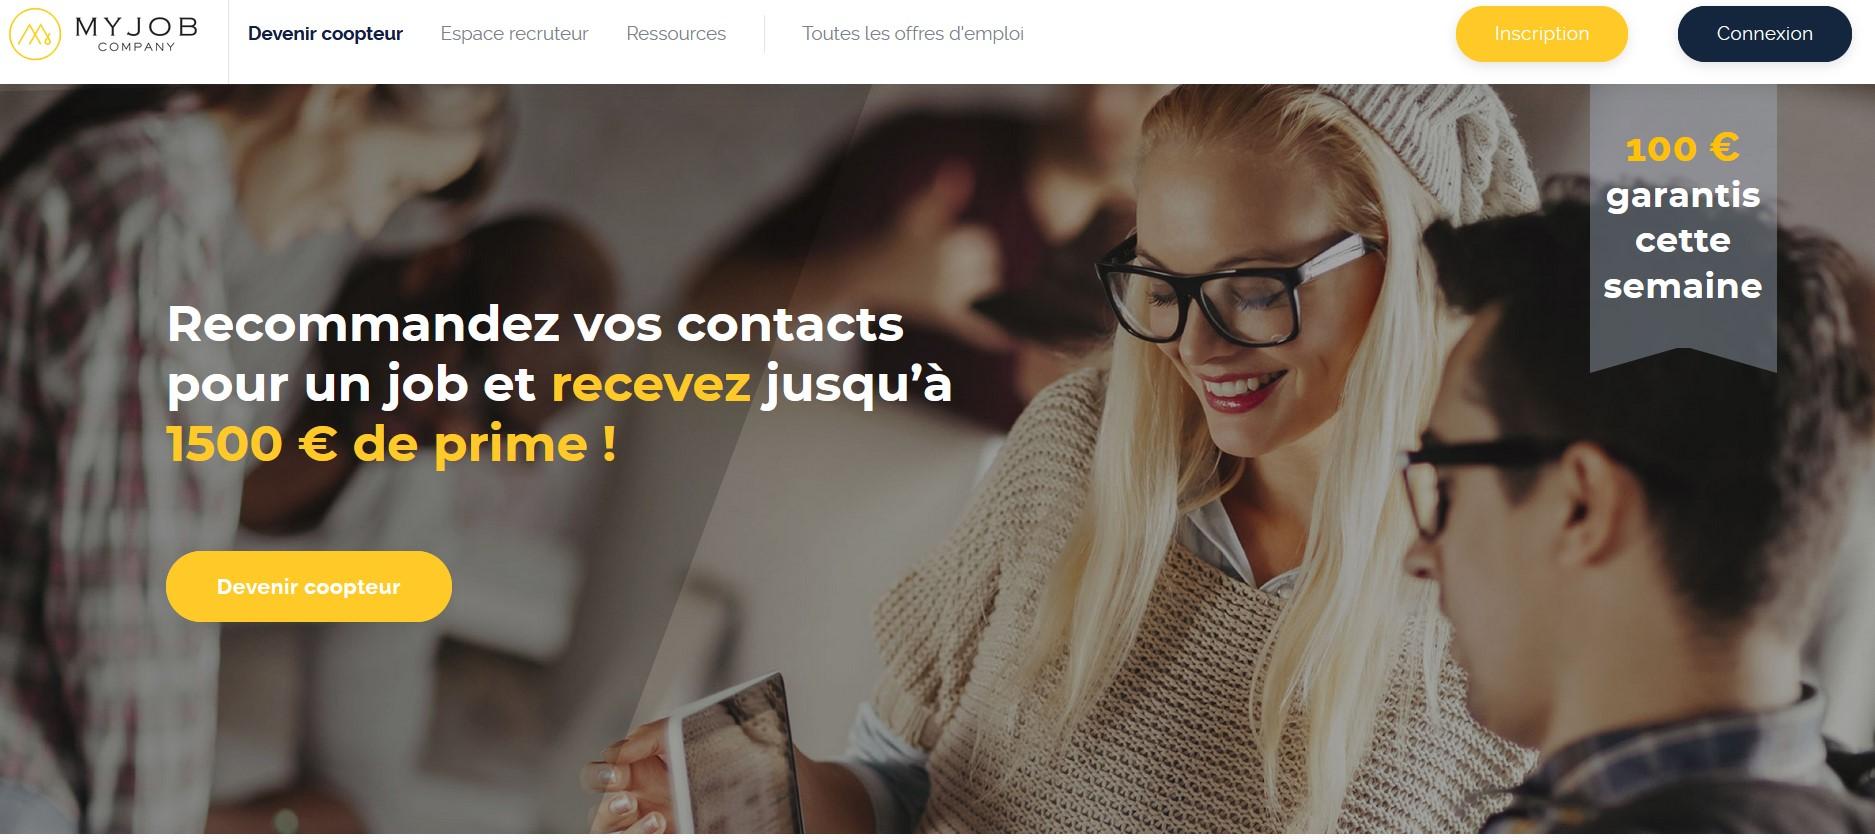 MyJobCompany - Gagner de l'argent en cooptant vos contacts